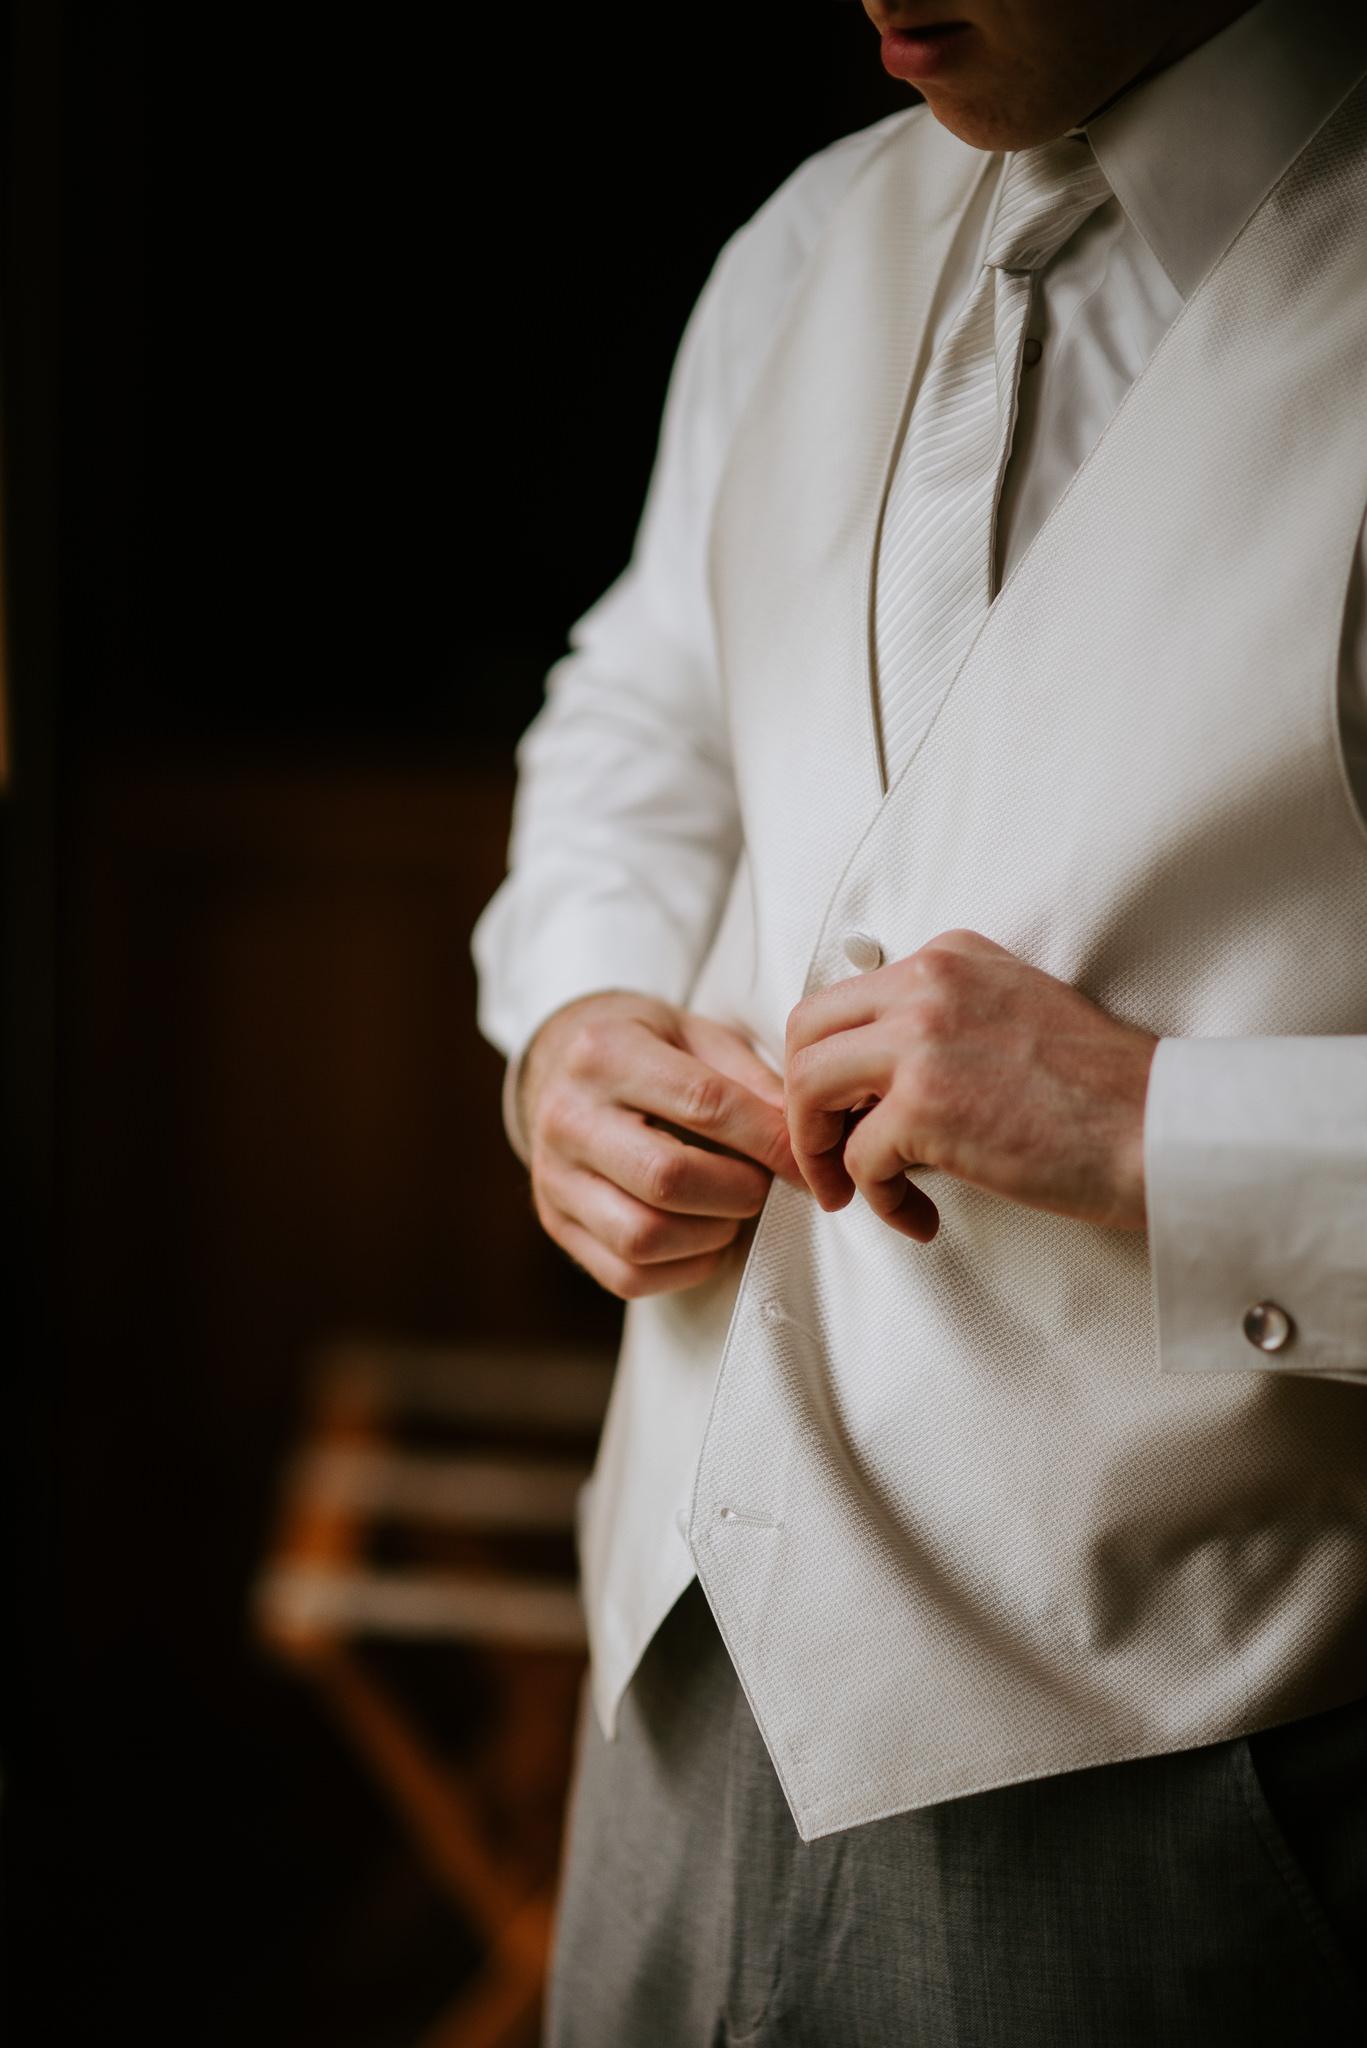 House Mountain Inn - Weddings - Lexington - Virginia - Best Wedding Photographer - Pat Cori Photography-14.jpg